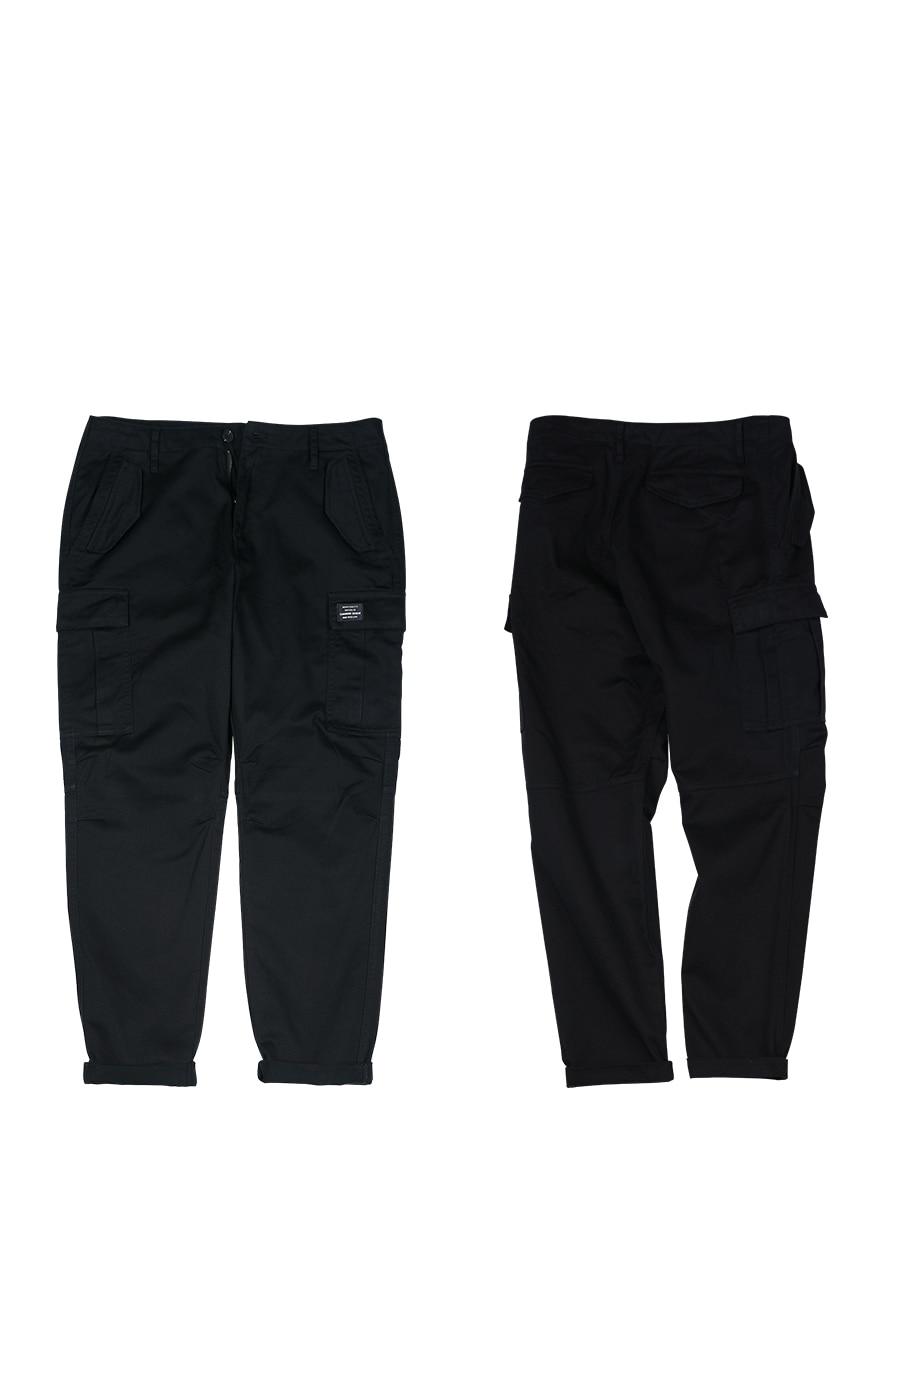 Ha1ed177498c346be8752867d32574be3f SIMWOOD New 2019 Casual Pants Men Fashion track Cargo Pants Ankle-Length military autumn Trousers Men pantalon hombre 180614